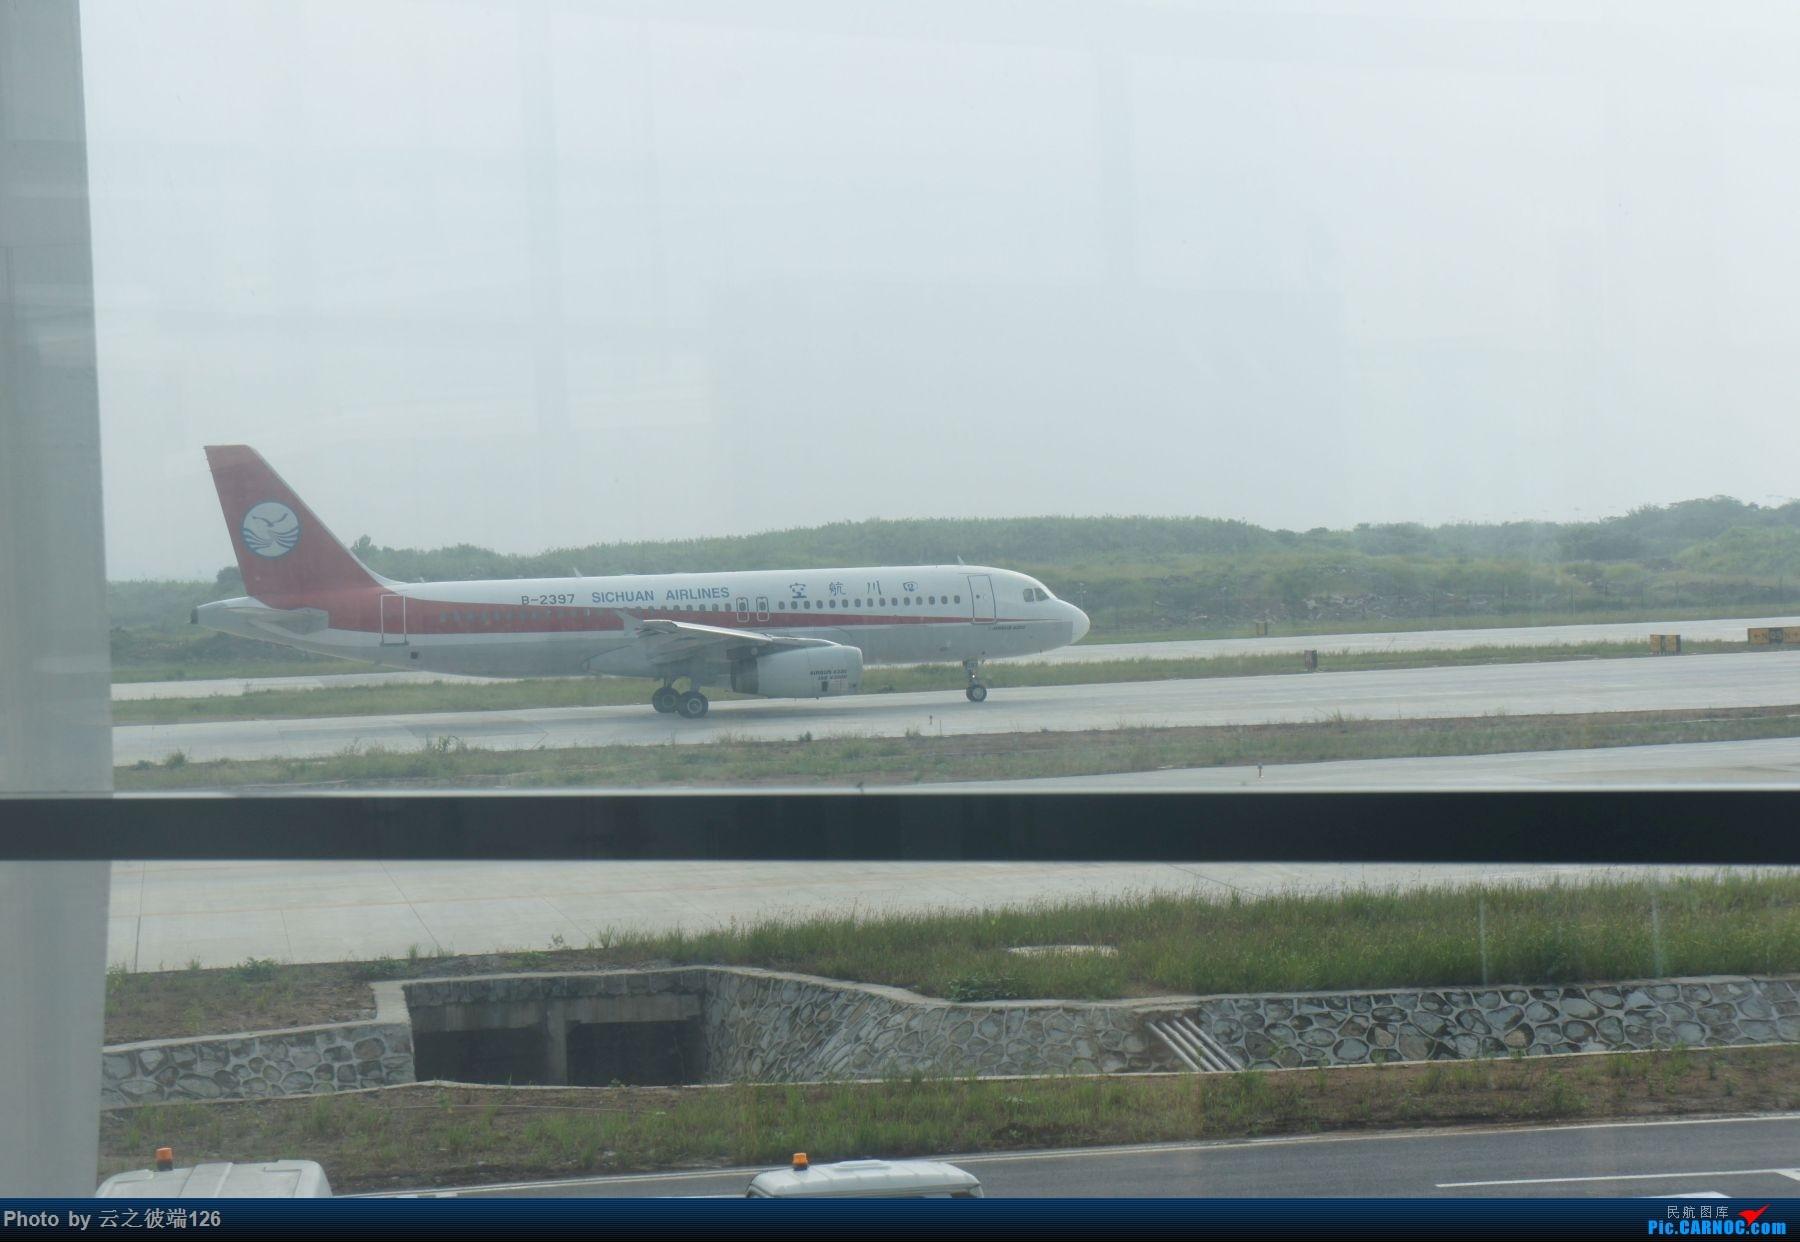 Re:[原创]迟到两年的游记 -----------NKG-SZX-NKG ZH+白菜航------ AIRBUS A320-200 B-2397 中国南京禄口国际机场